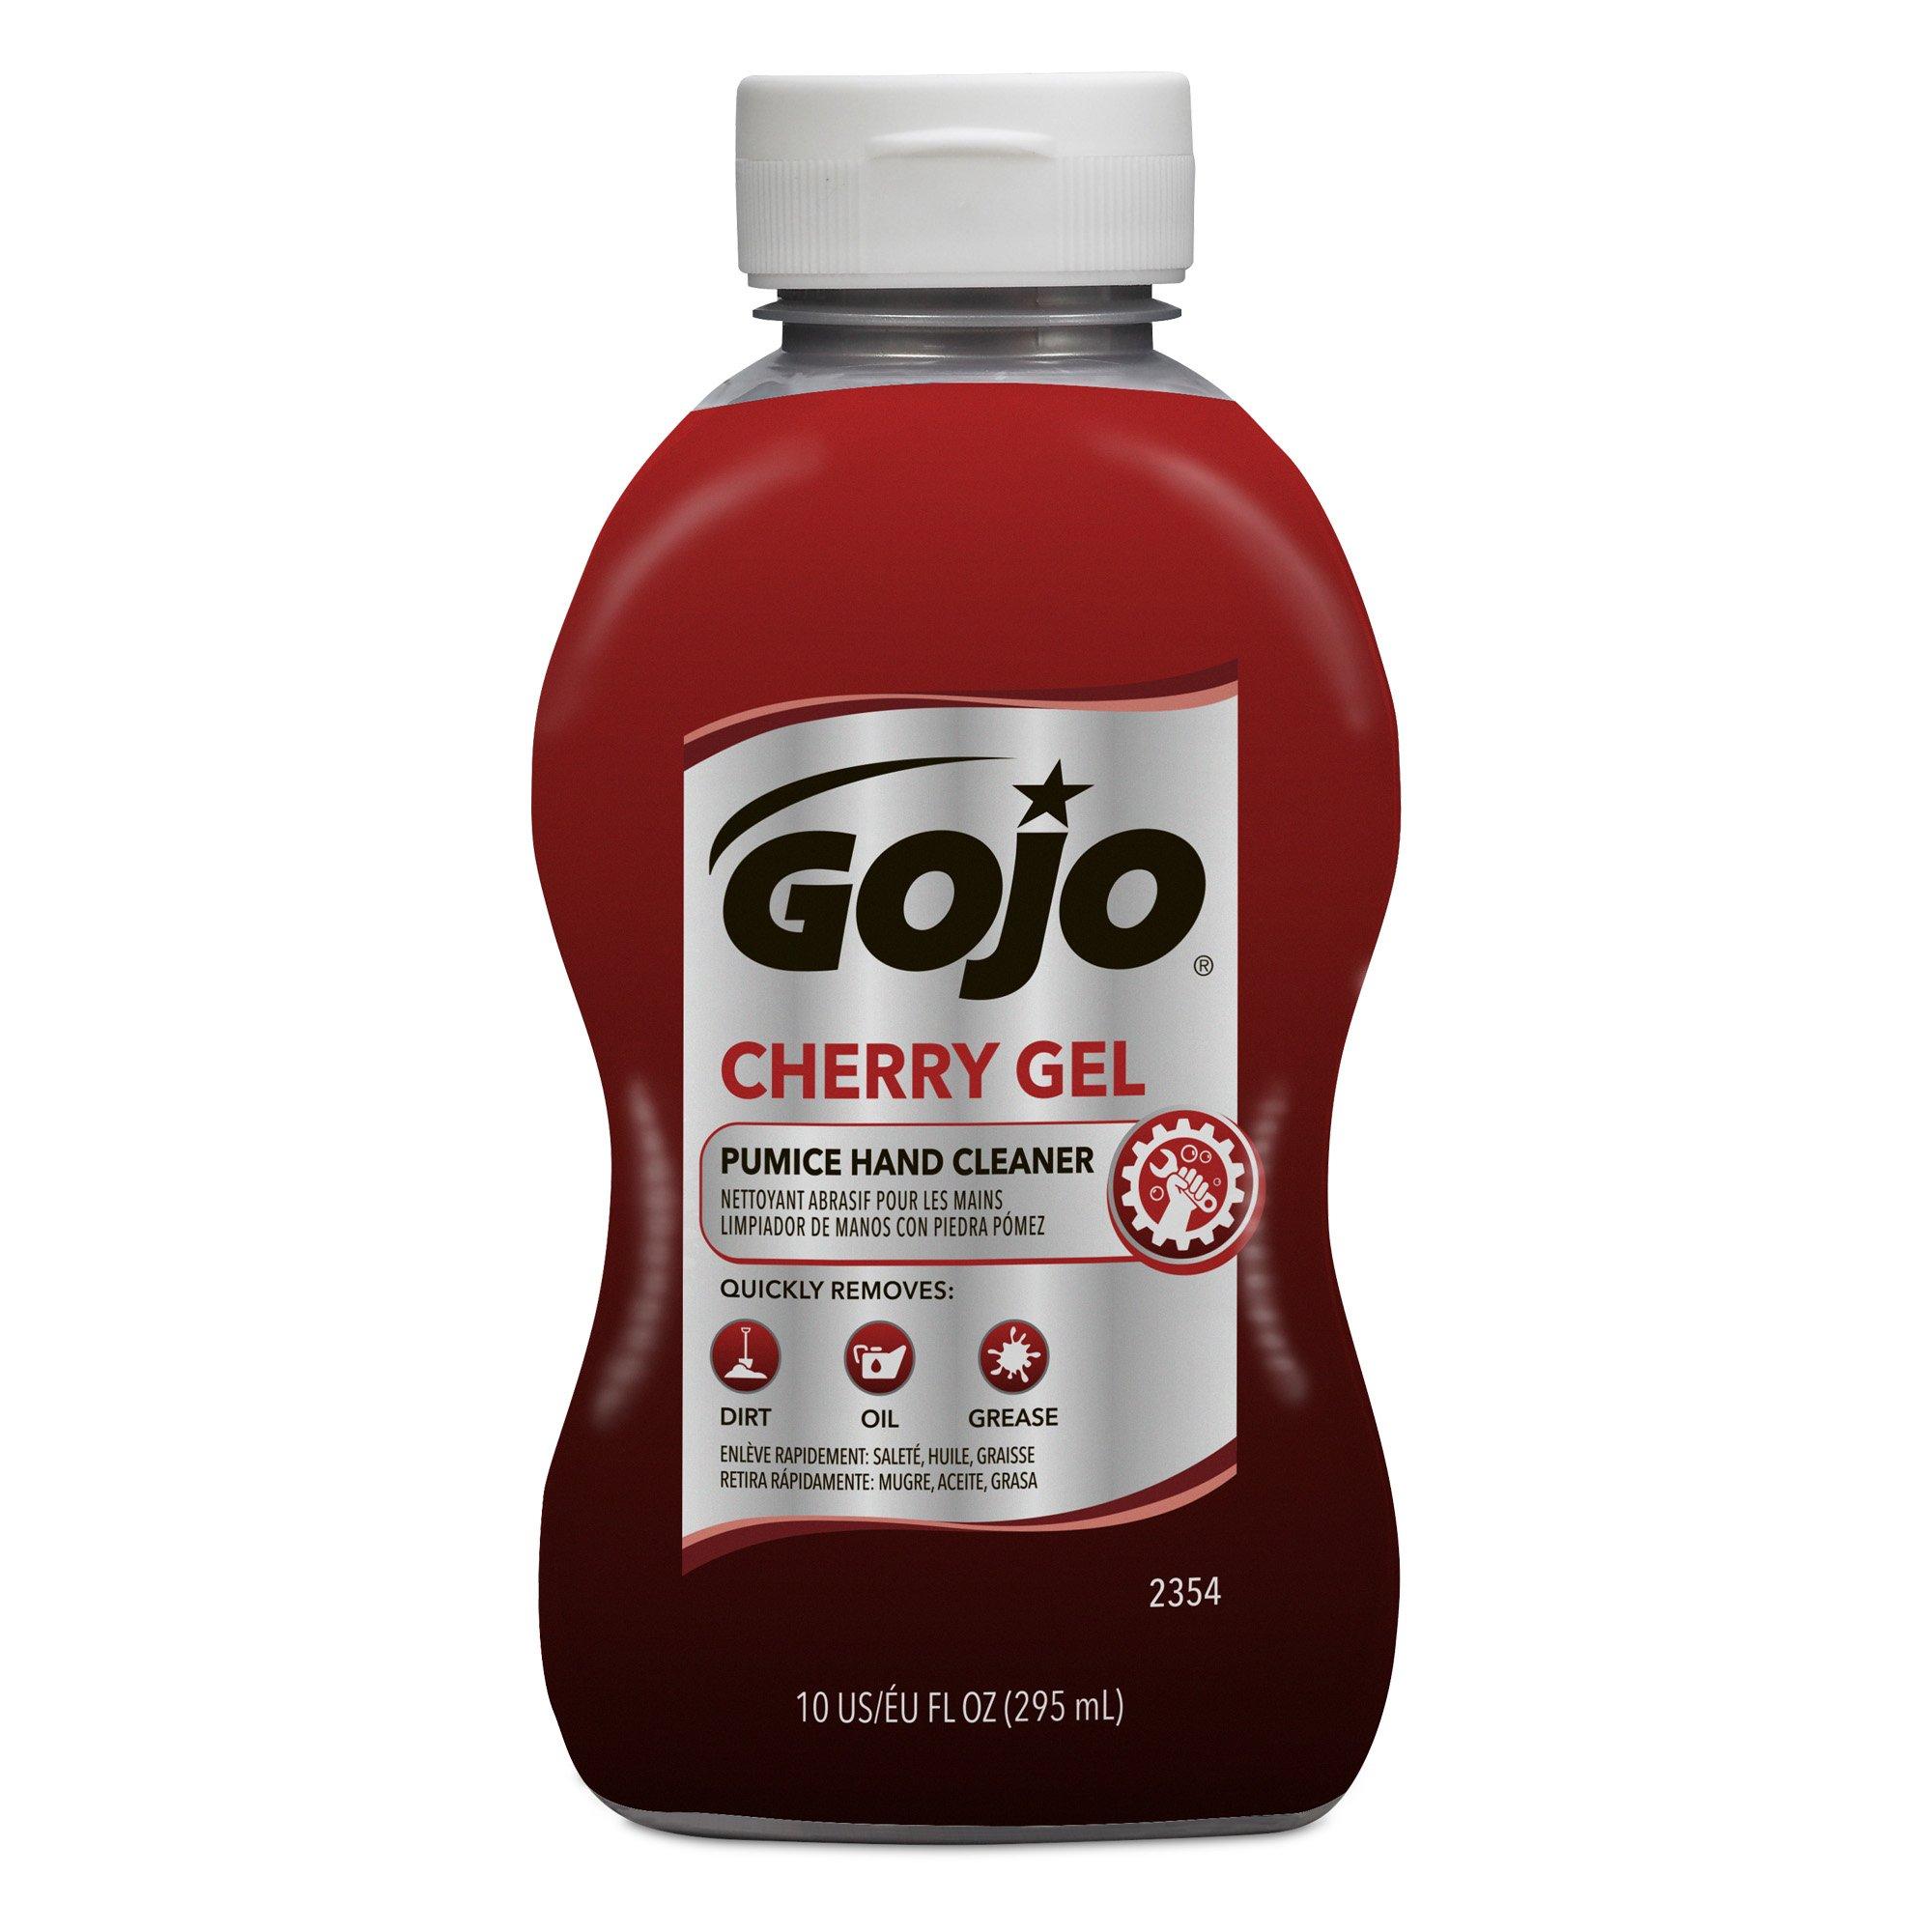 GOJO Cherry Gel Pumice Hand Cleaner, Cherry Fragrance, 10 fl oz Heavy Duty Hand Cleaner Flip Cap Squeeze Bottle (Case of 8) - 2354-08 by Gojo (Image #2)